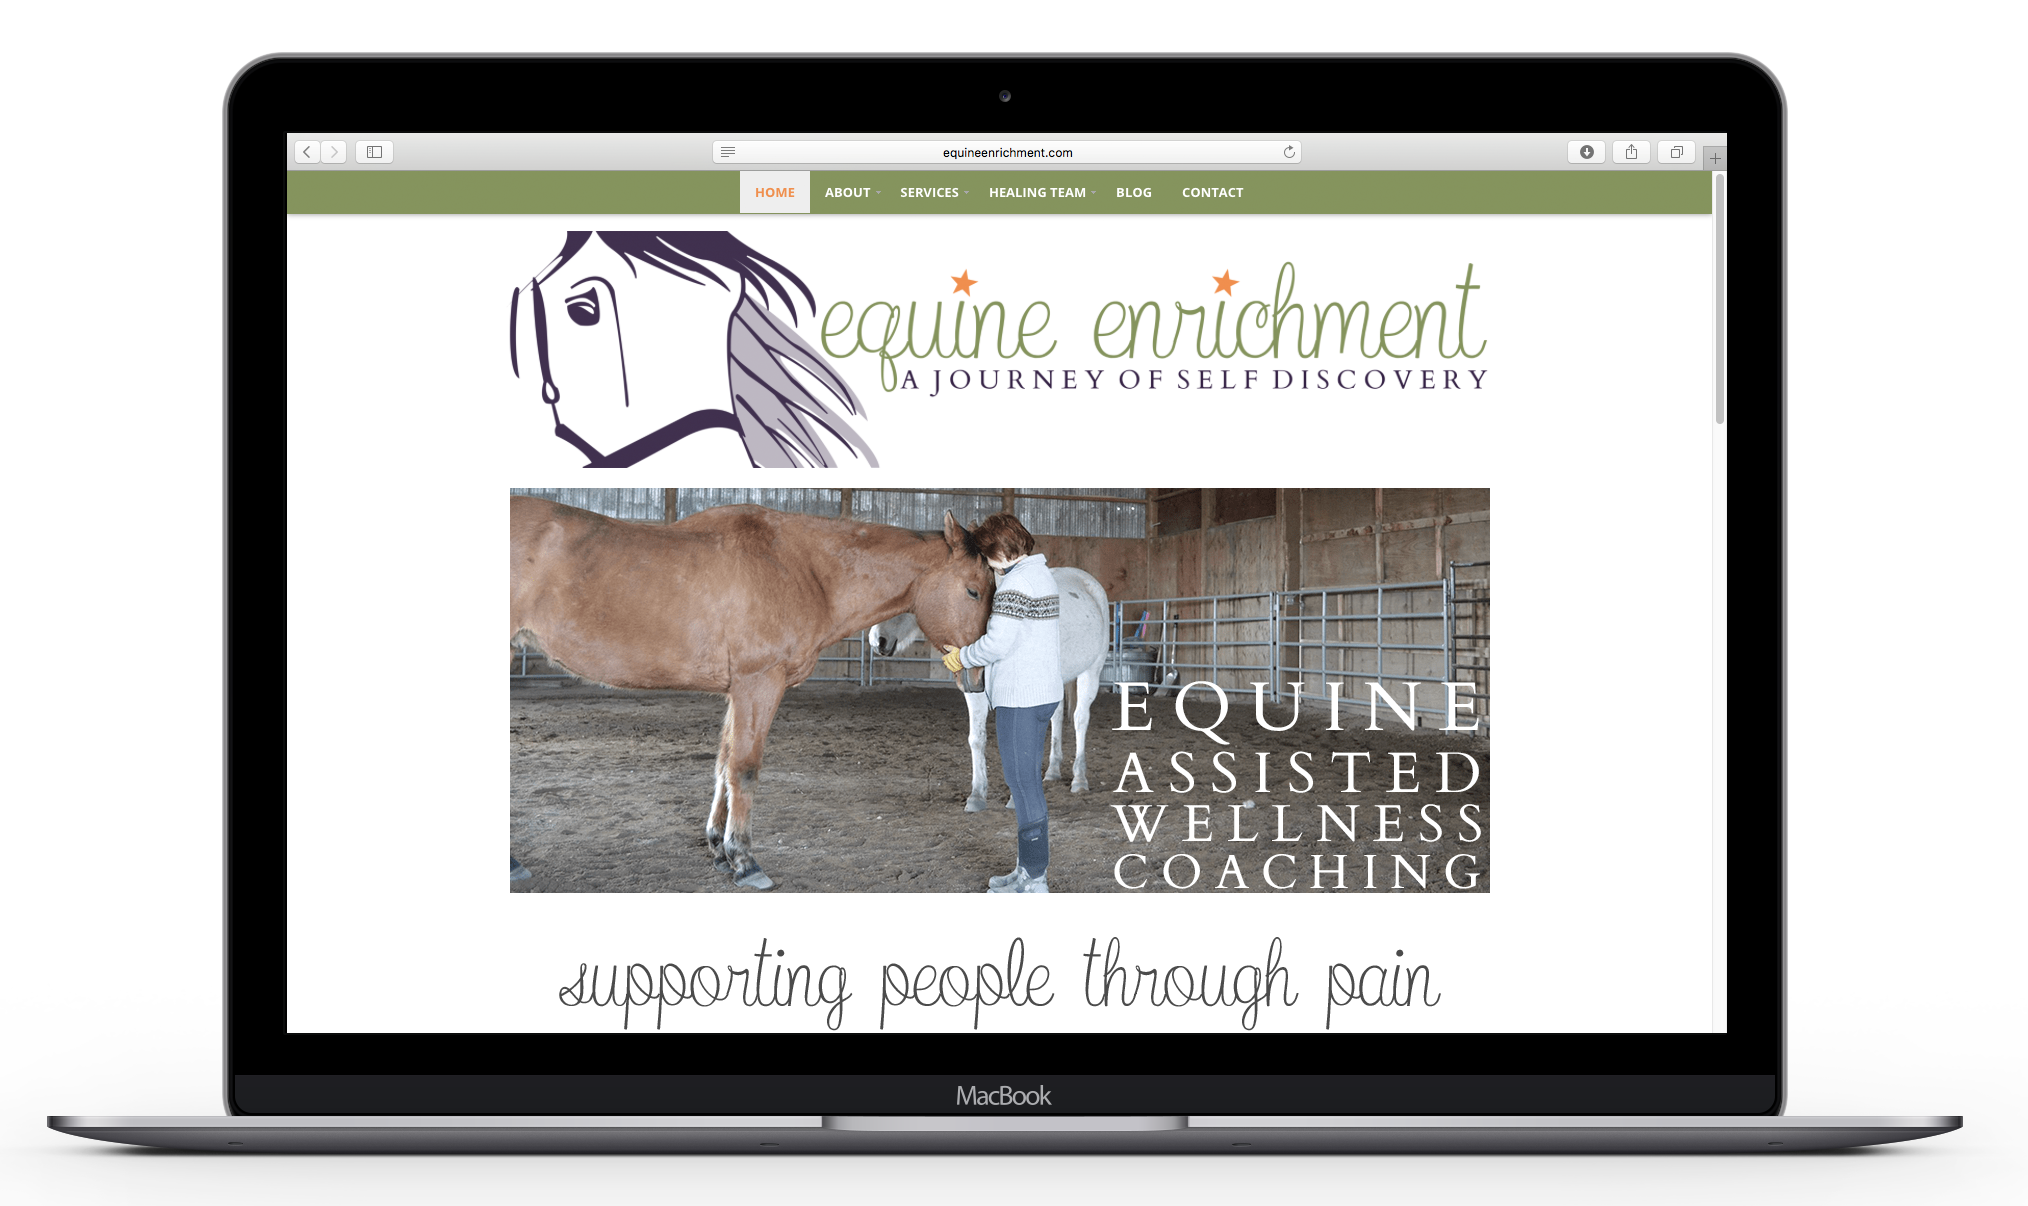 Macbook Equine Enrichment.png